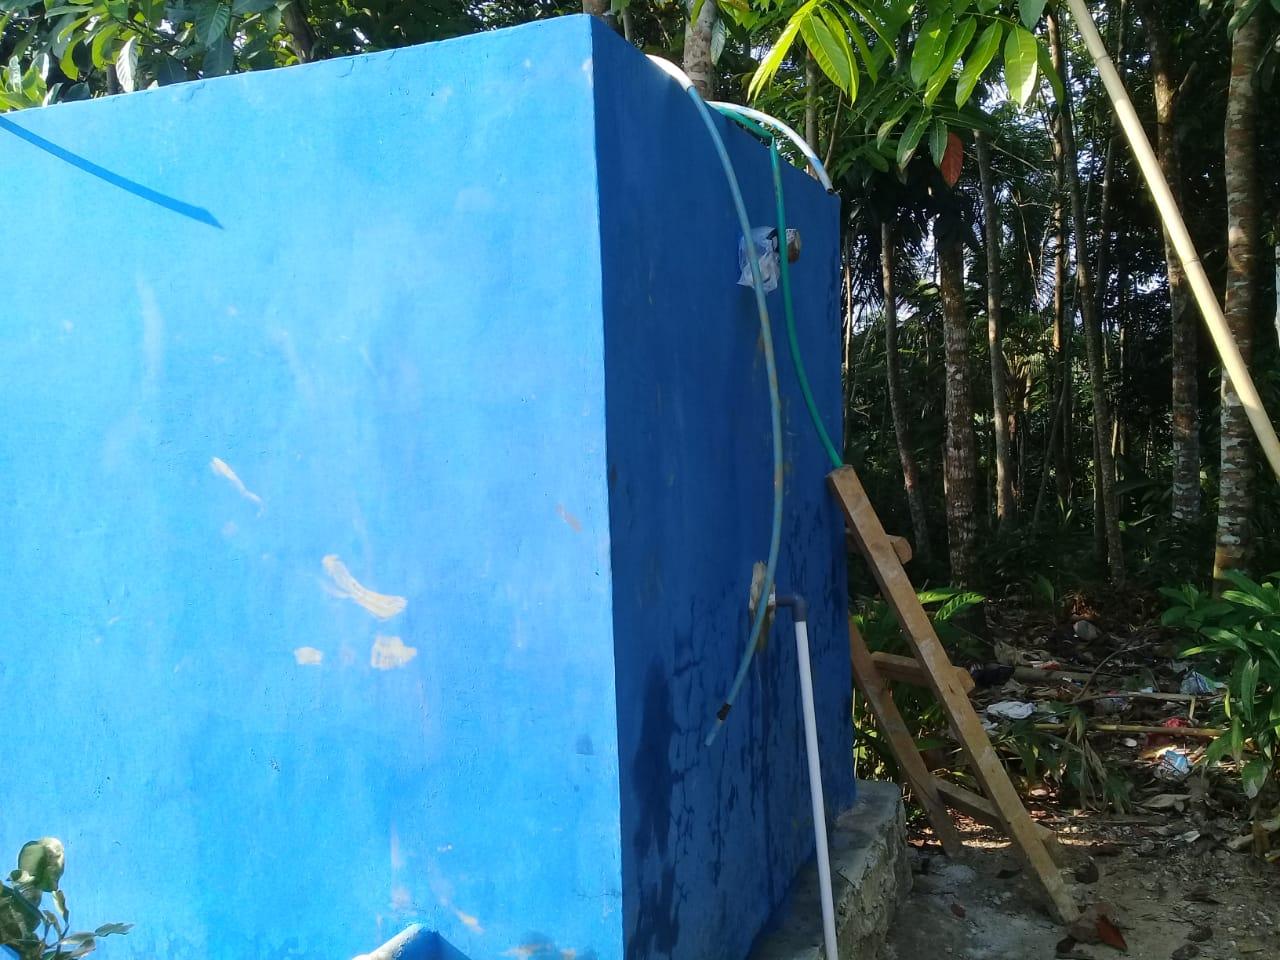 Gambar Pembangunan Broncaptering di Ciseureuheun Dikeluhkan Warga, Ini Dalih Direktur CV Sri Bintang 11